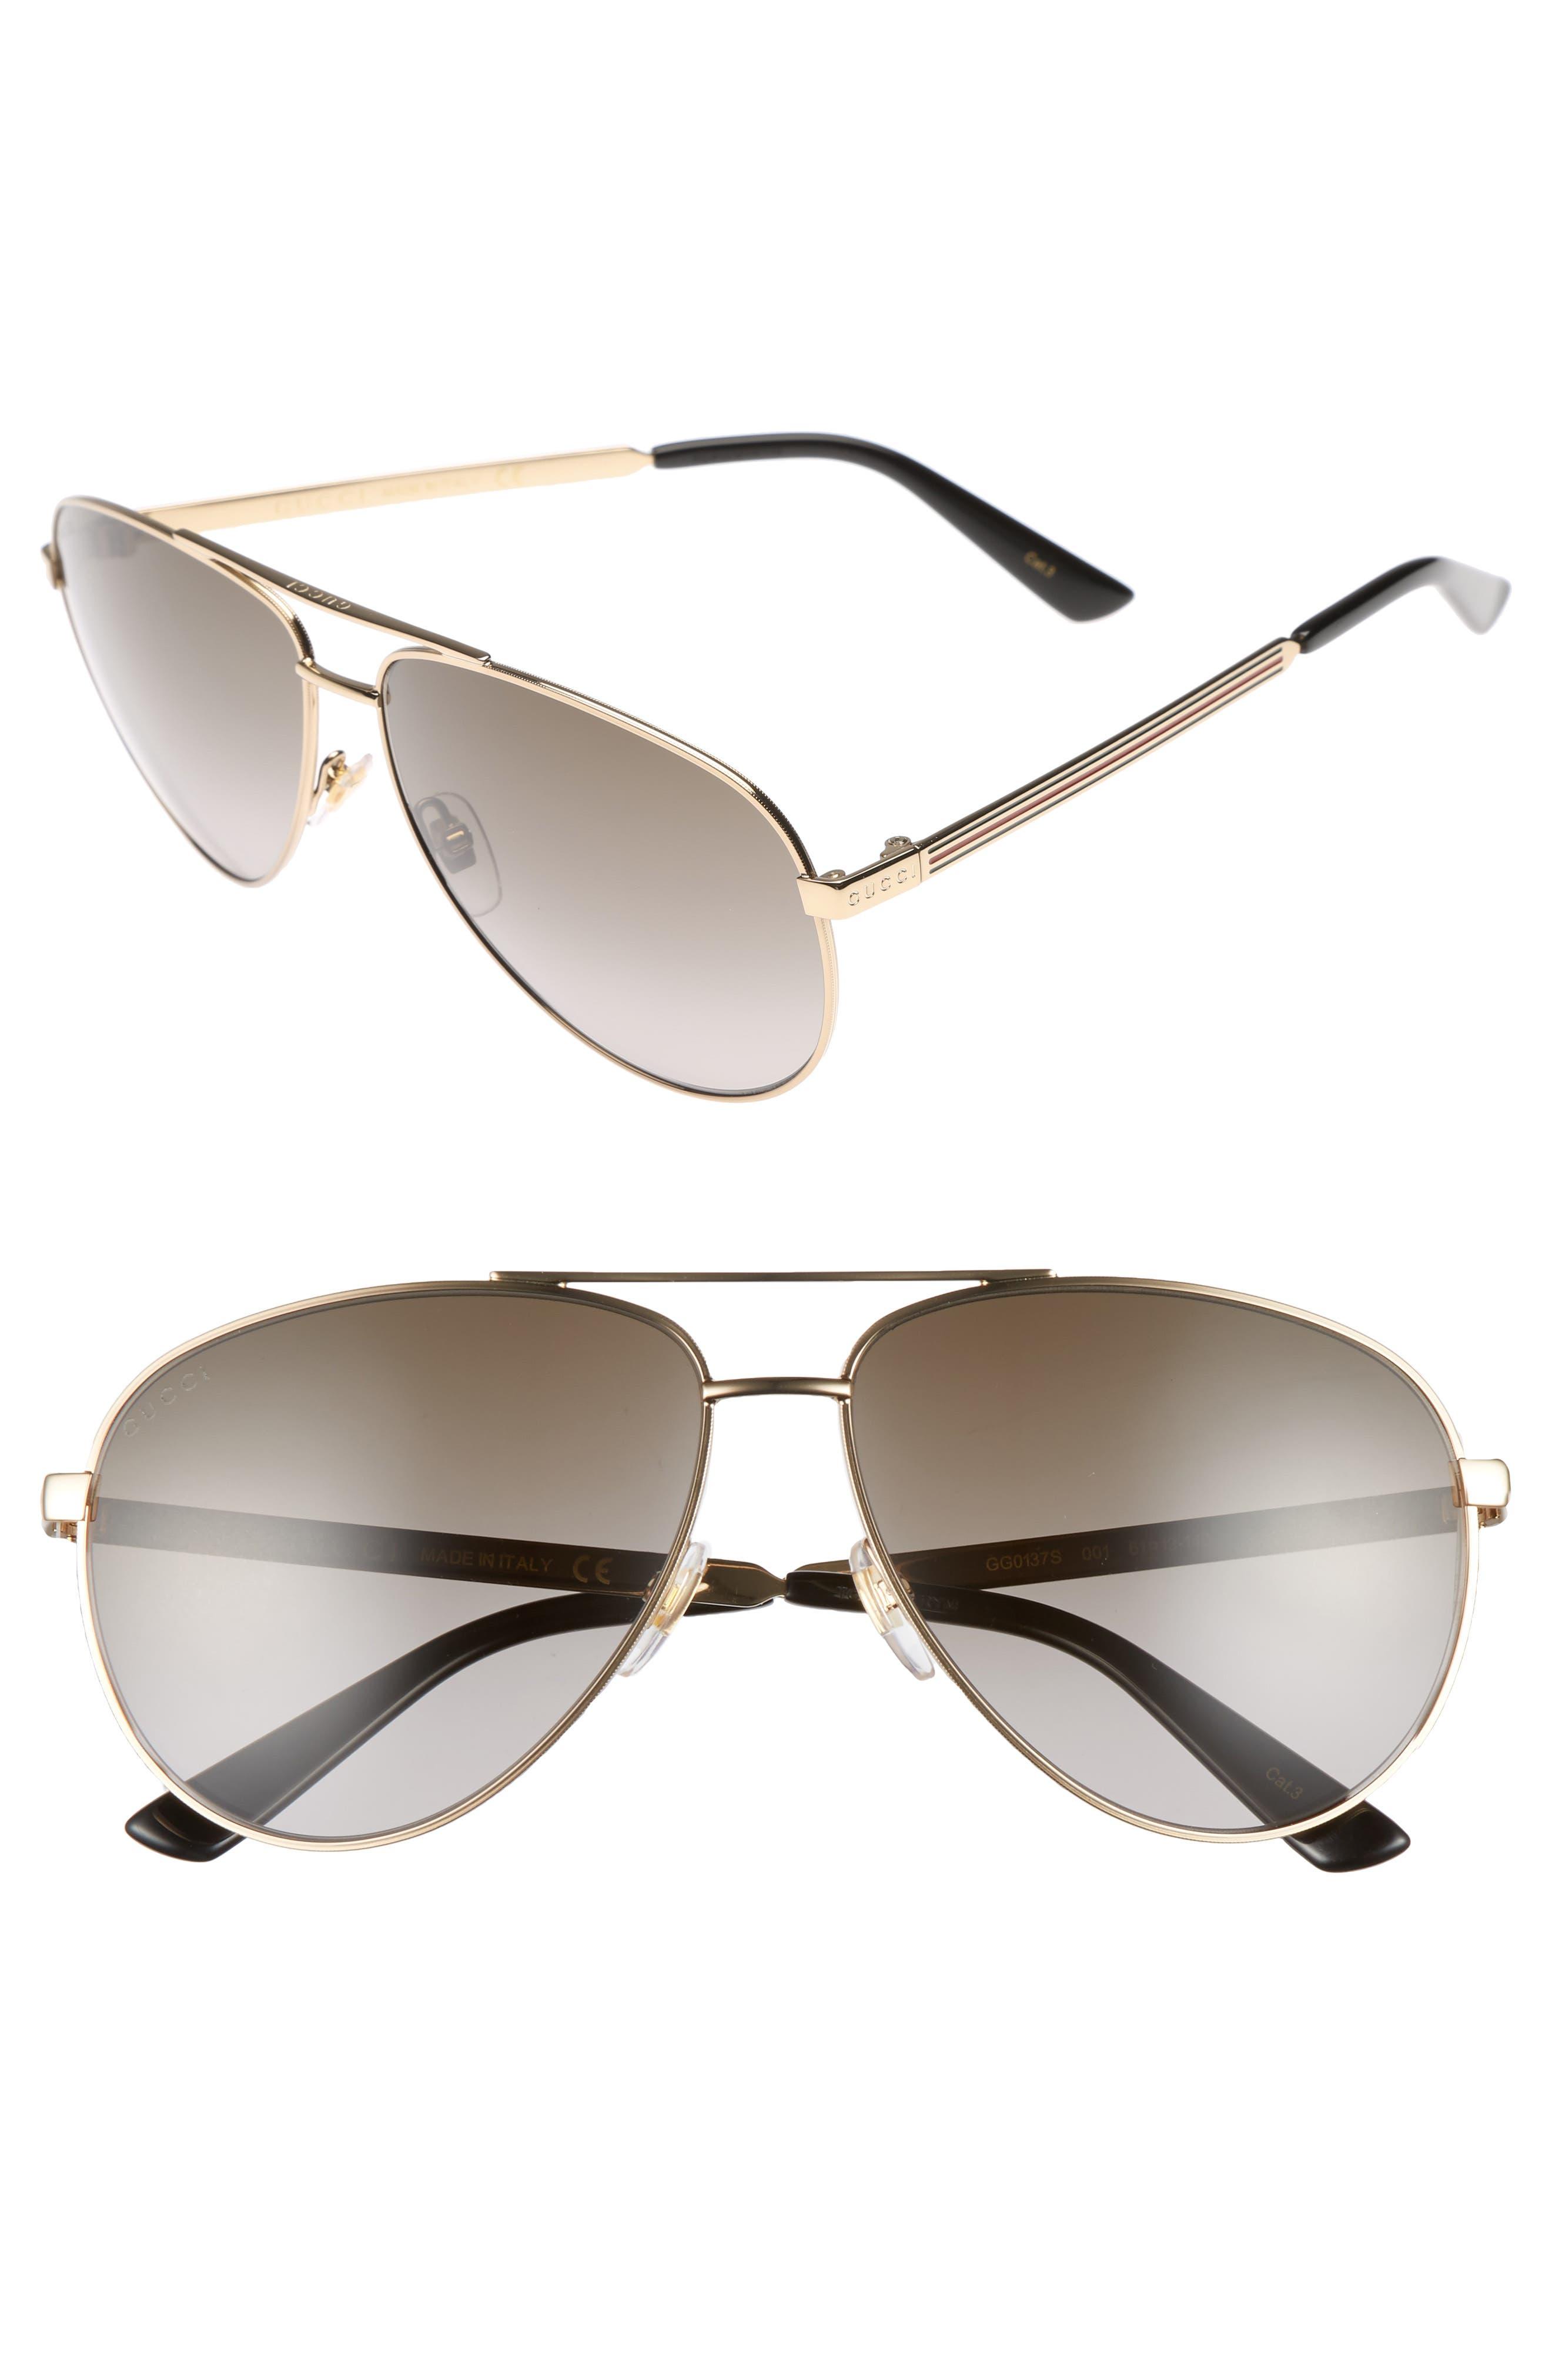 61mm Aviator Sunglasses,                         Main,                         color, GOLD/BROWN